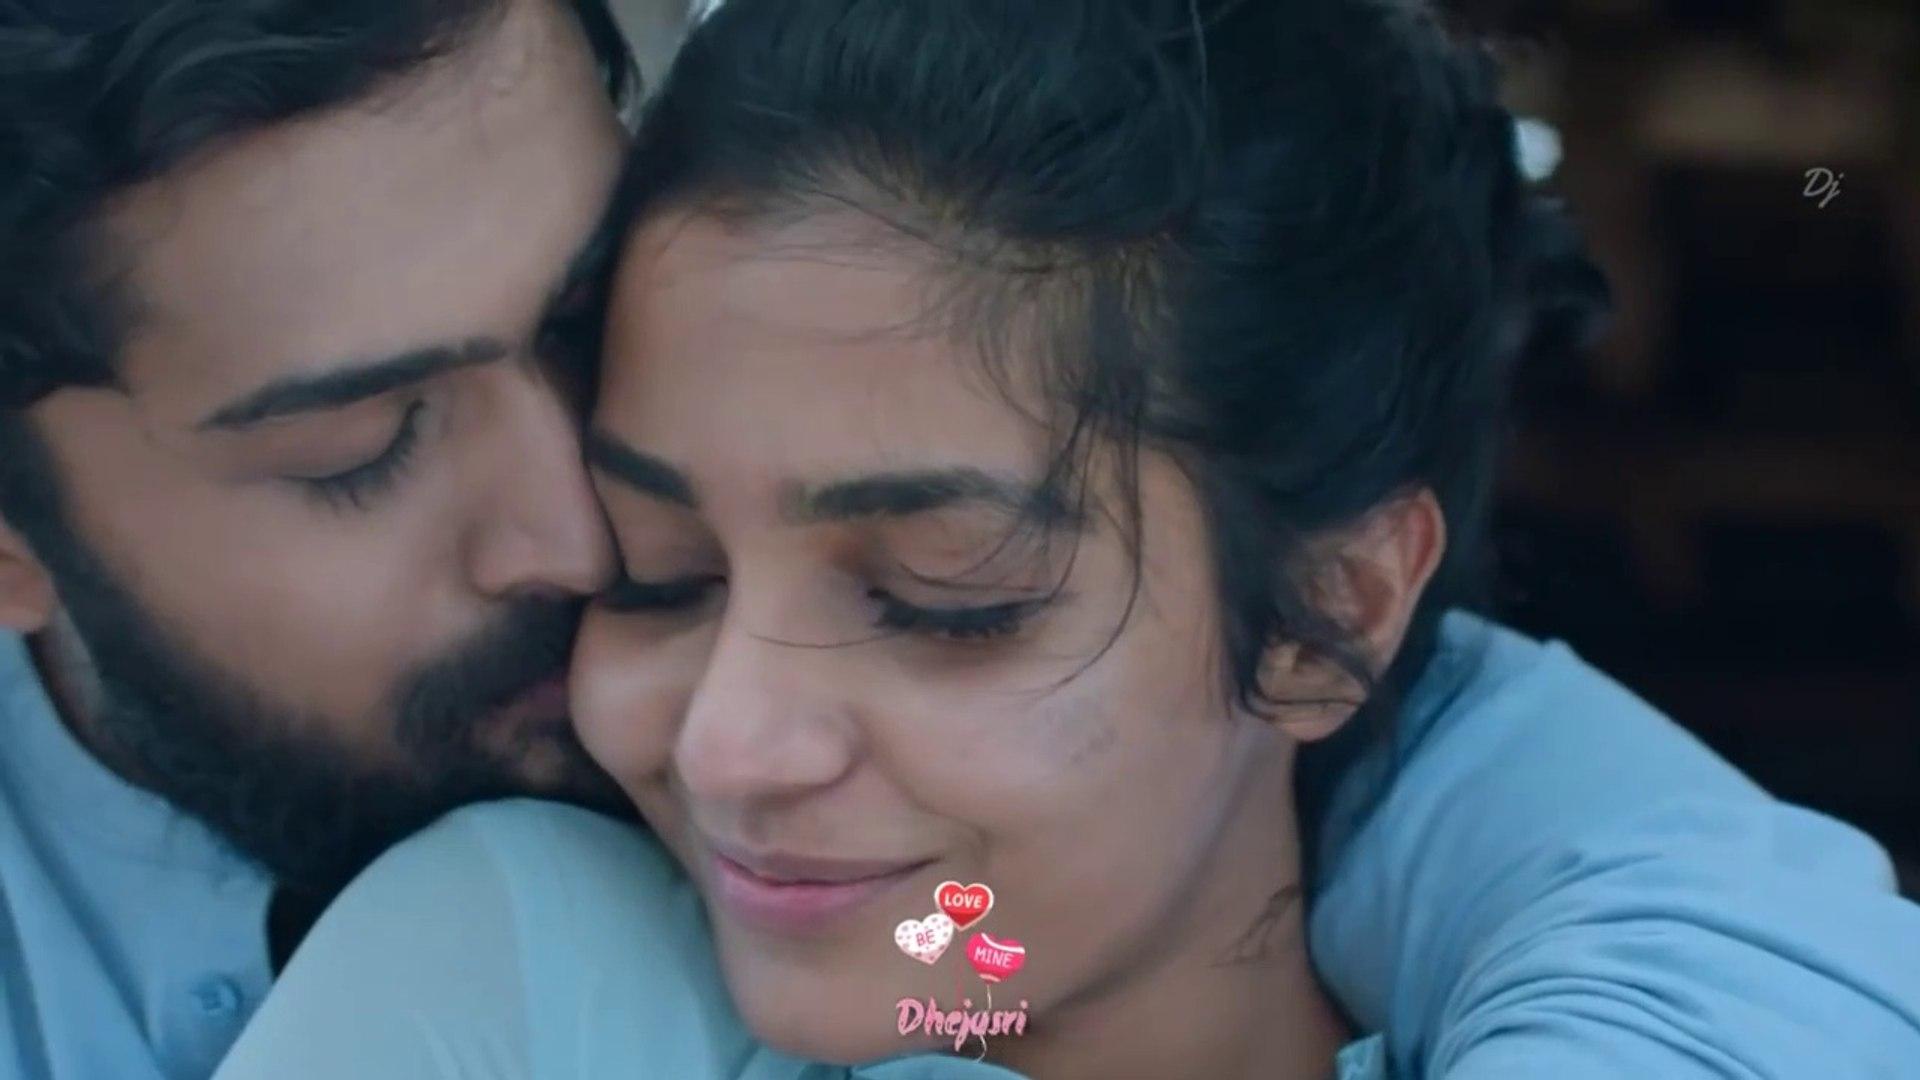 Best status whatsapp 2019 song lyrics in dating ❤️ hindi Bollywood status